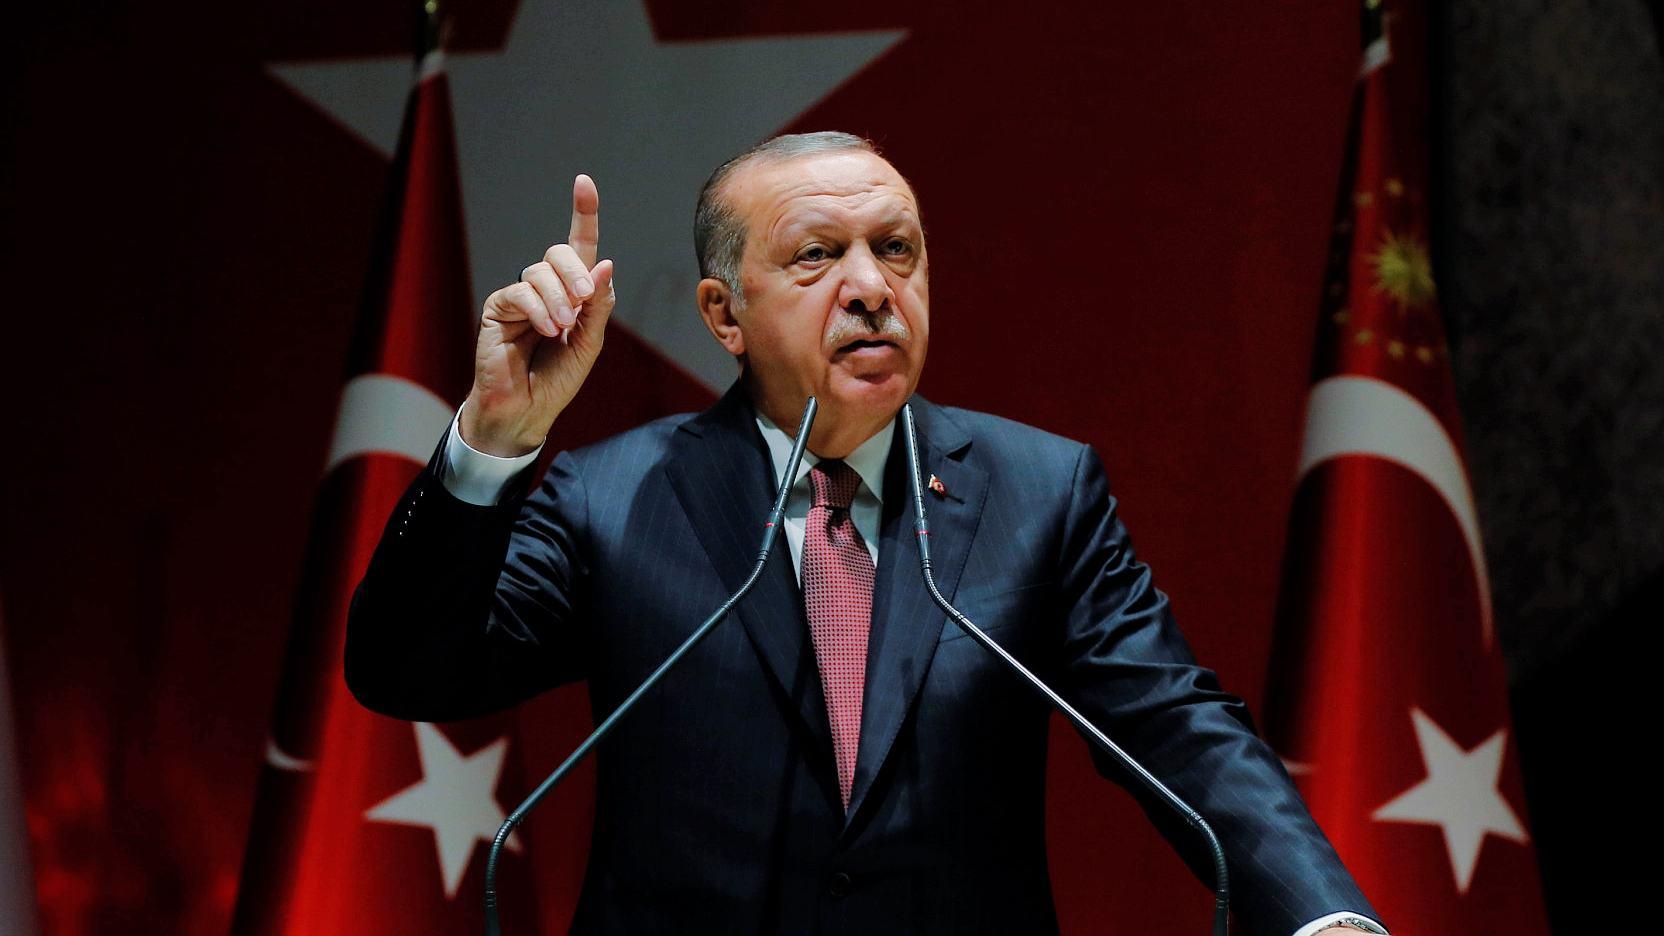 Erdogan implicates Saudi gov't for the first time in Khashoggi murder